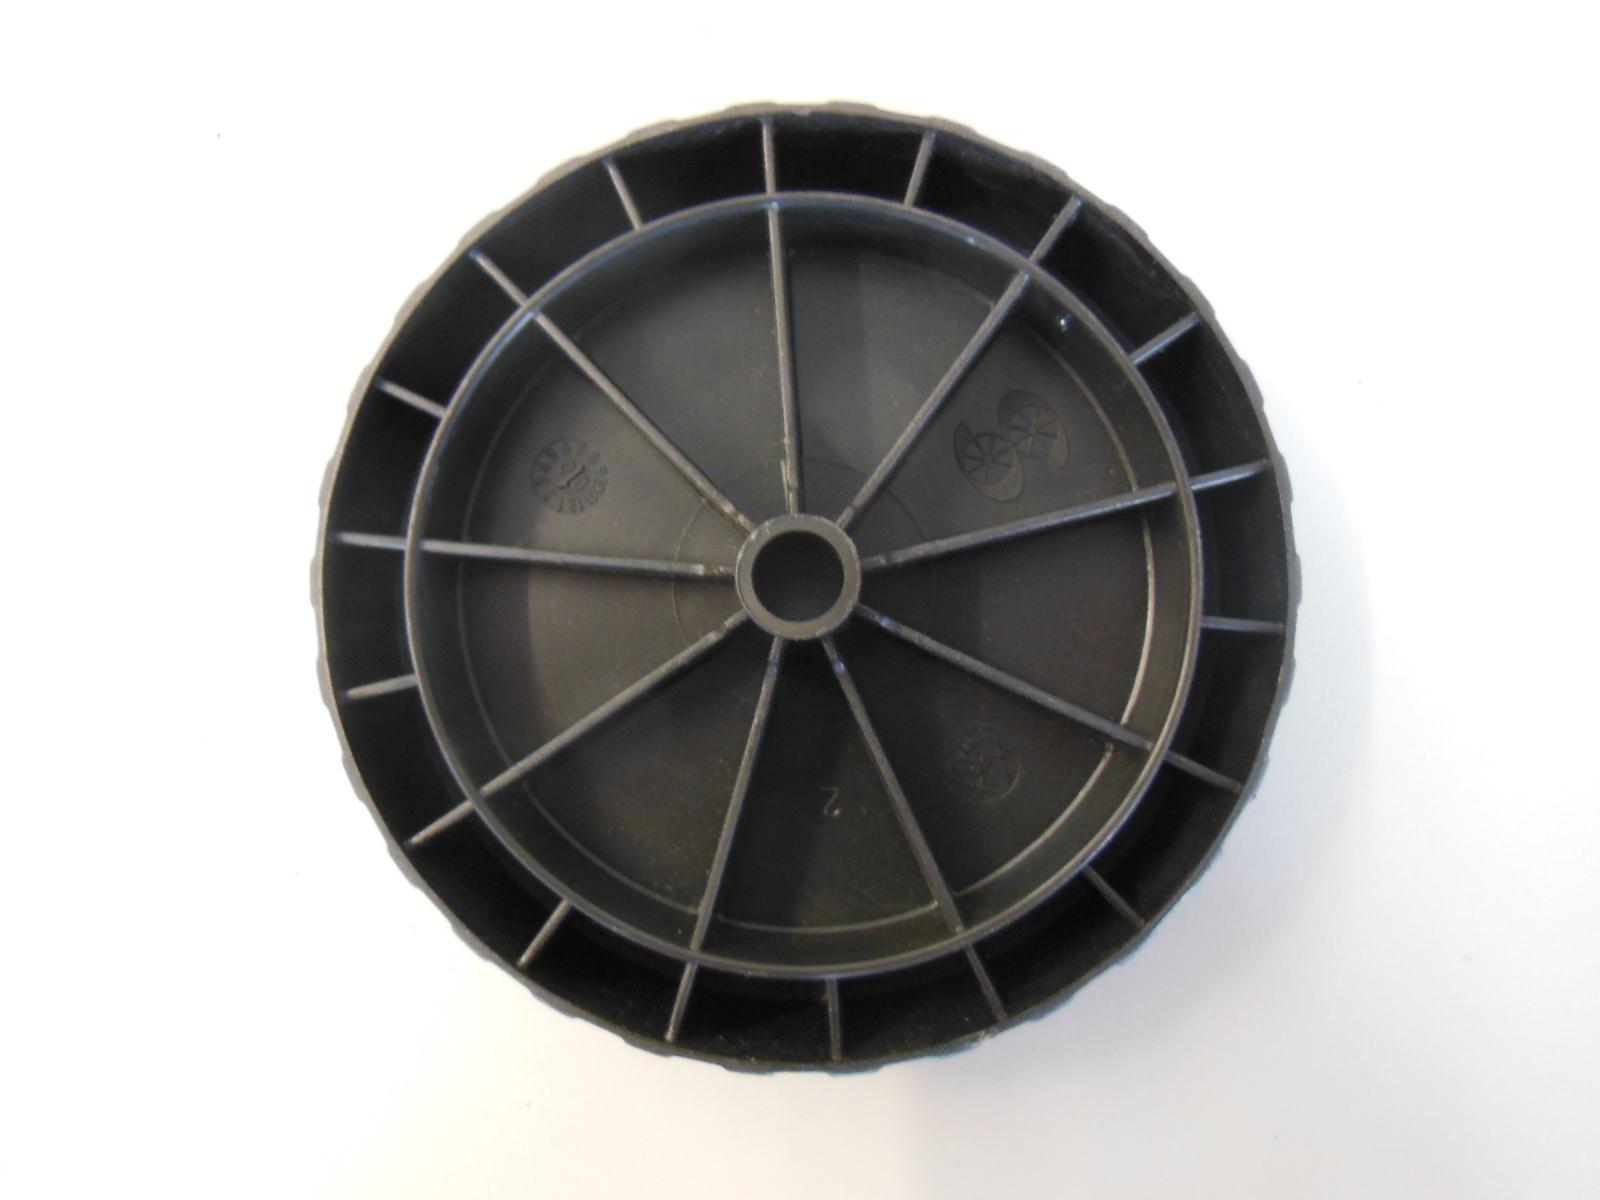 rad ersatzrad rasenm her 140mm 101005 ebay. Black Bedroom Furniture Sets. Home Design Ideas